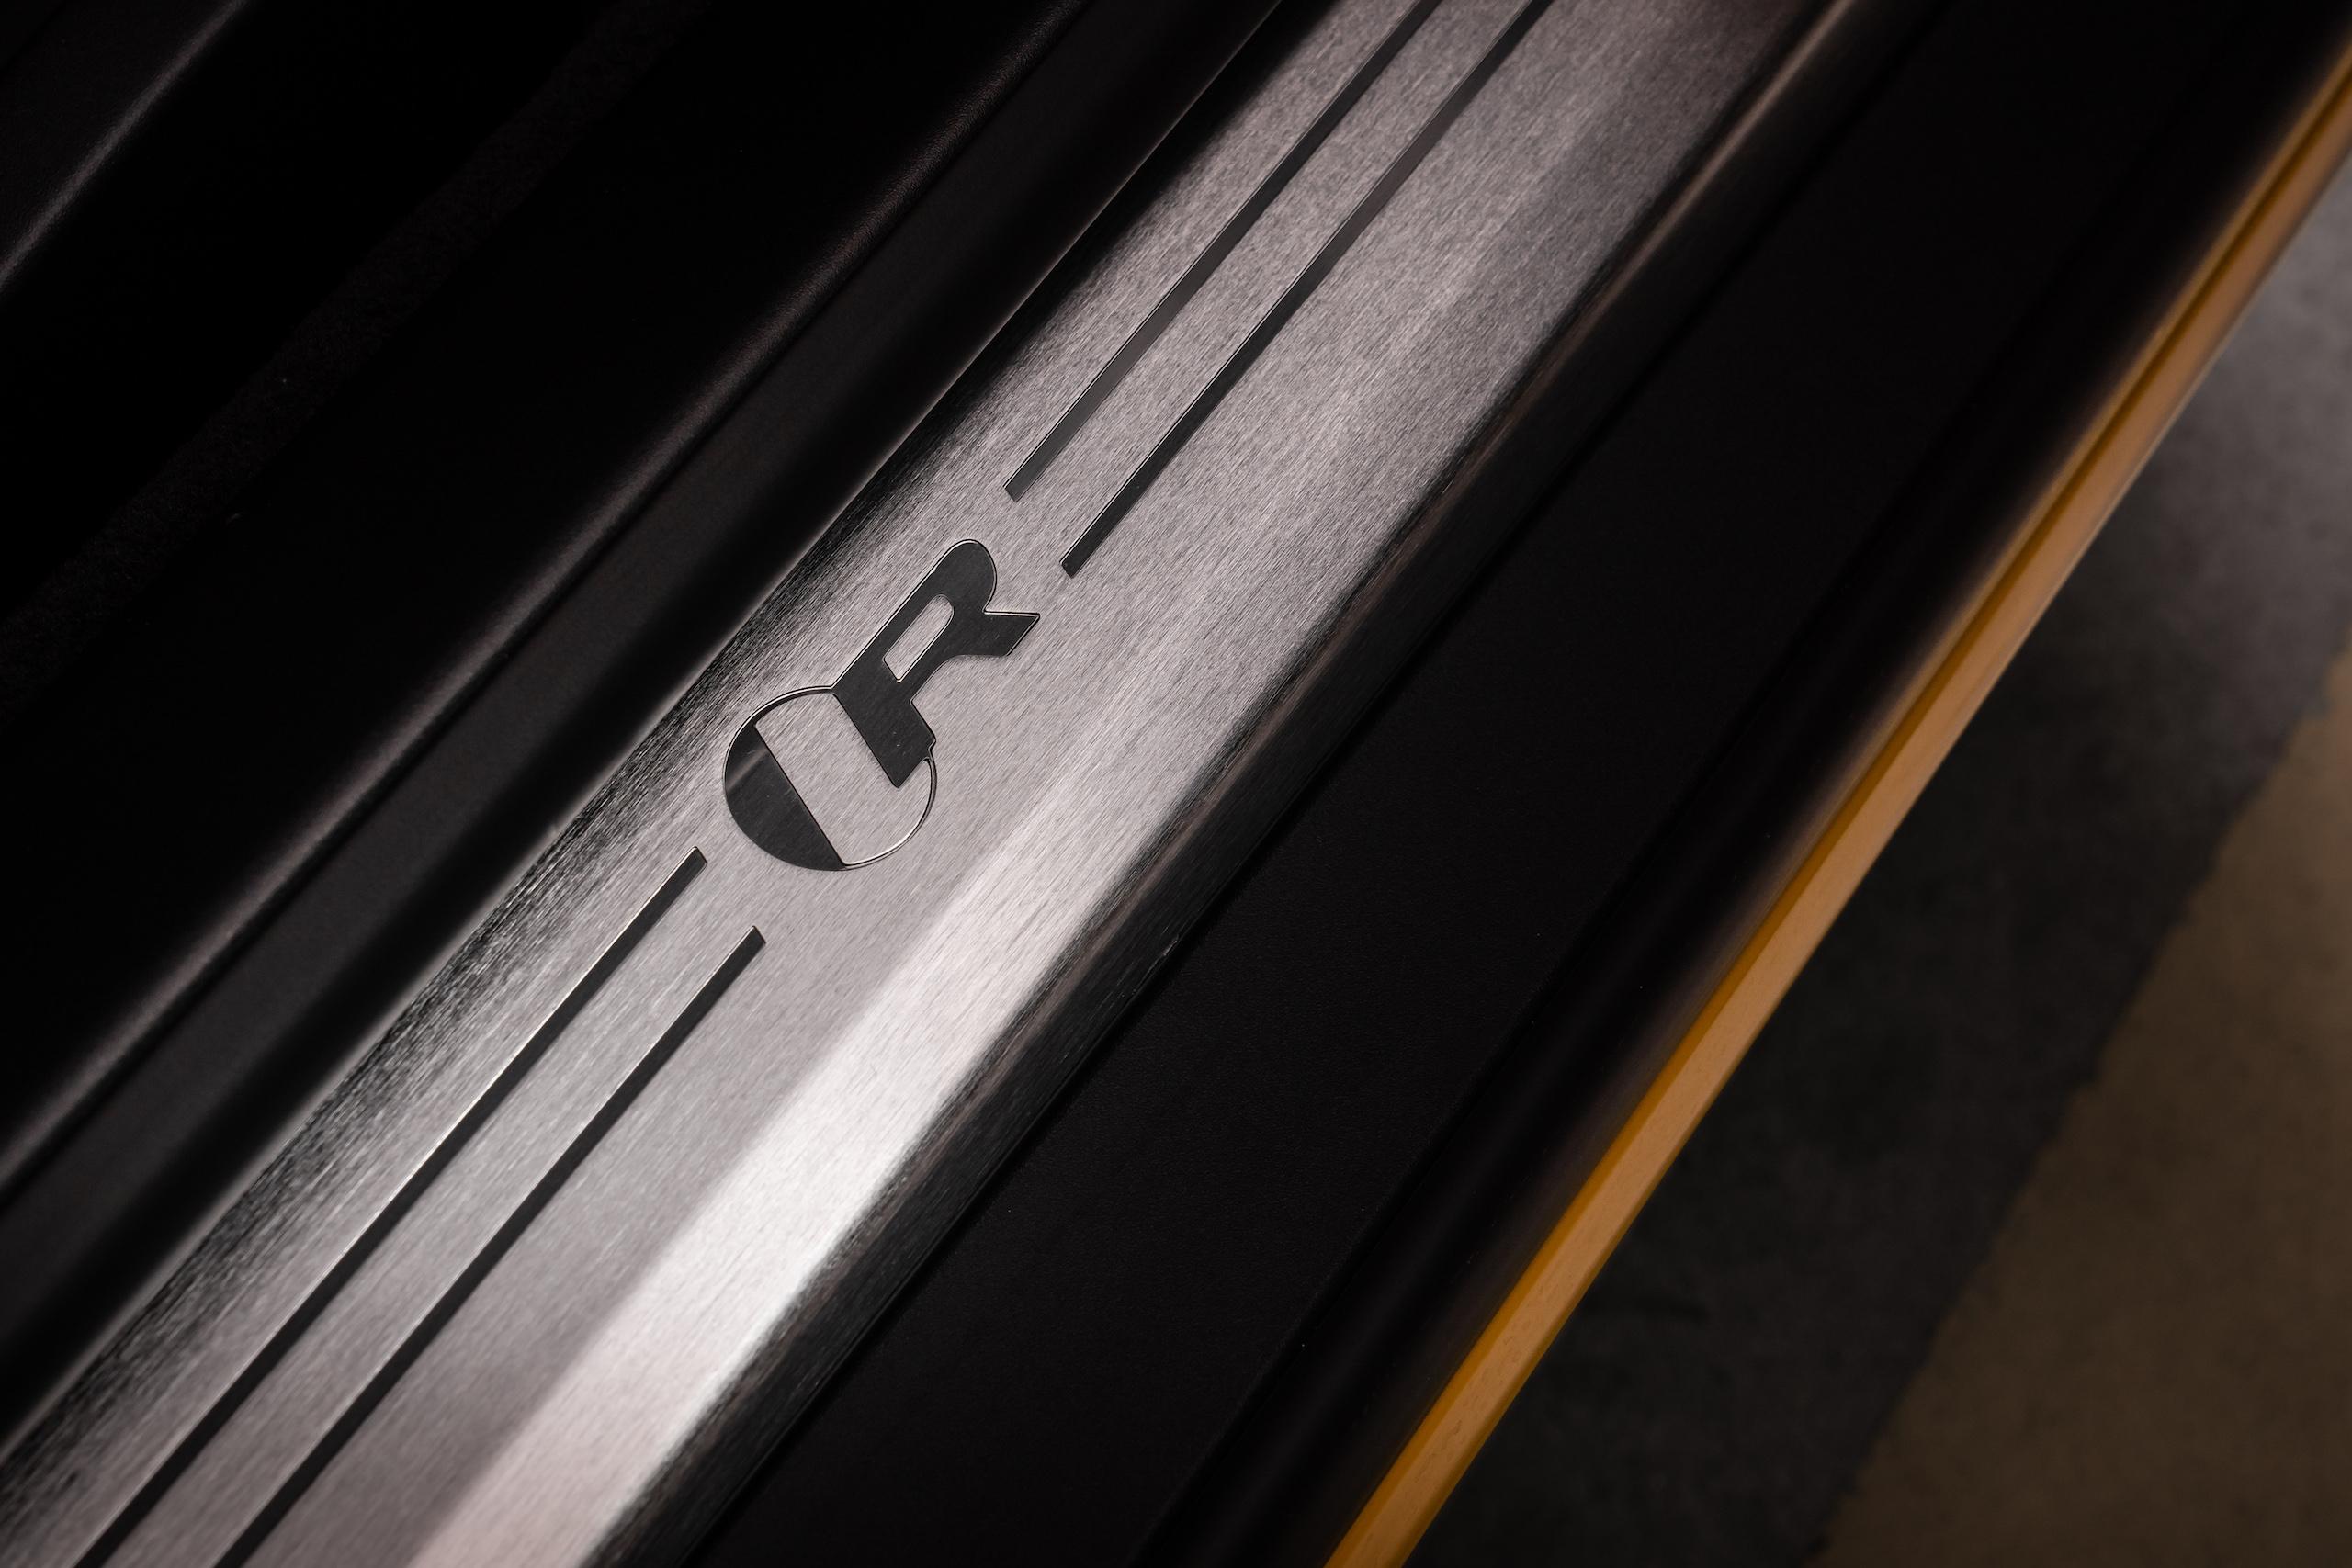 2021 Jaguar F-TYPE_R Coupe interior door sill detail